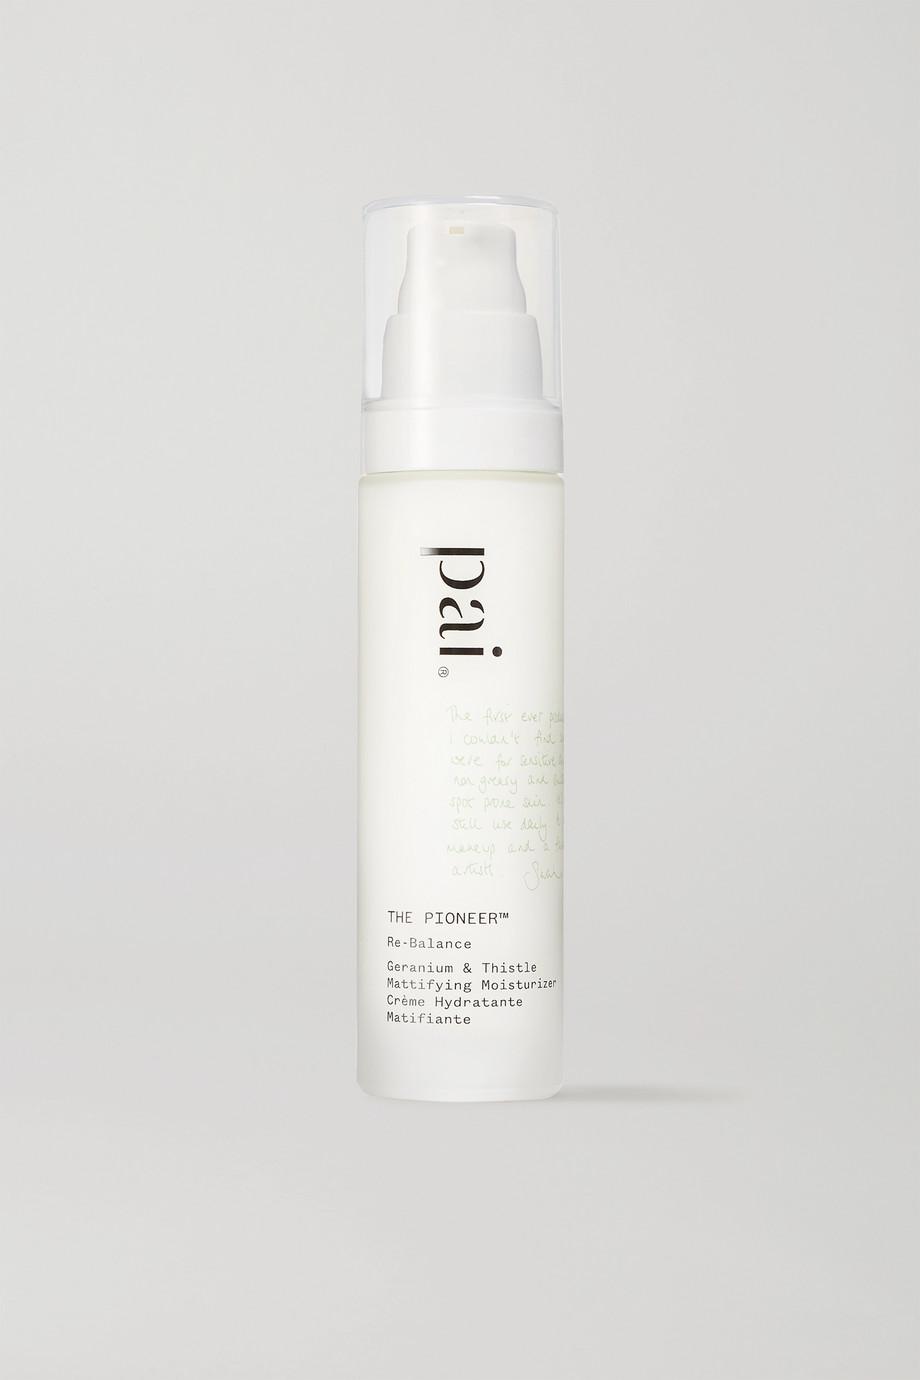 Pai Skincare + NET SUSTAIN Geranium & Thistle Rebalancing Day Cream, 50ml